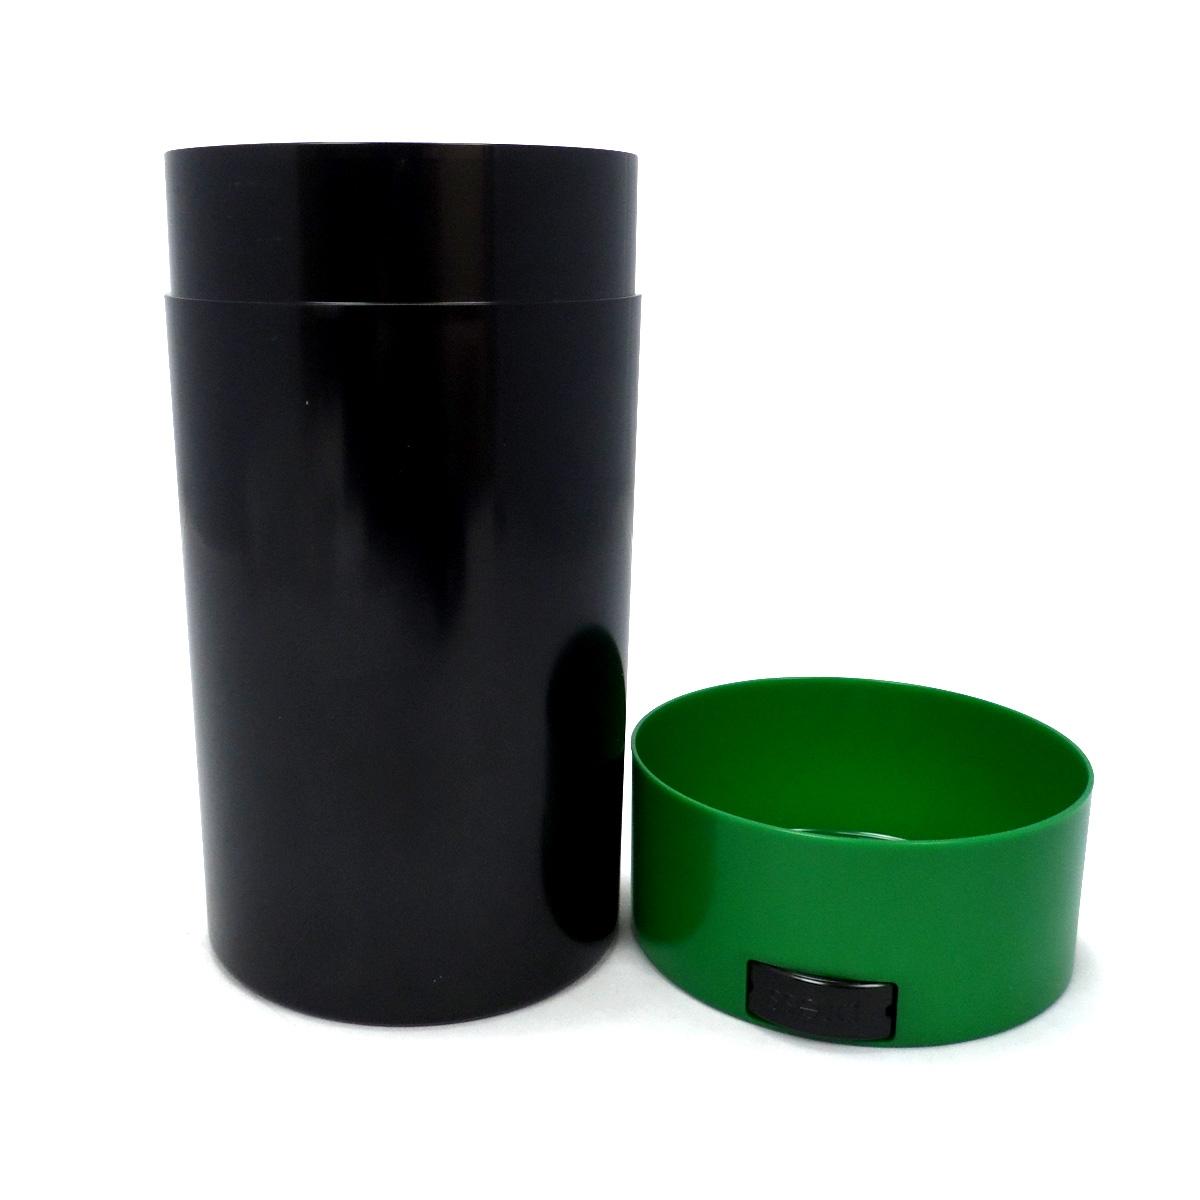 tightvac litres pour la conservation alimentaire. Black Bedroom Furniture Sets. Home Design Ideas